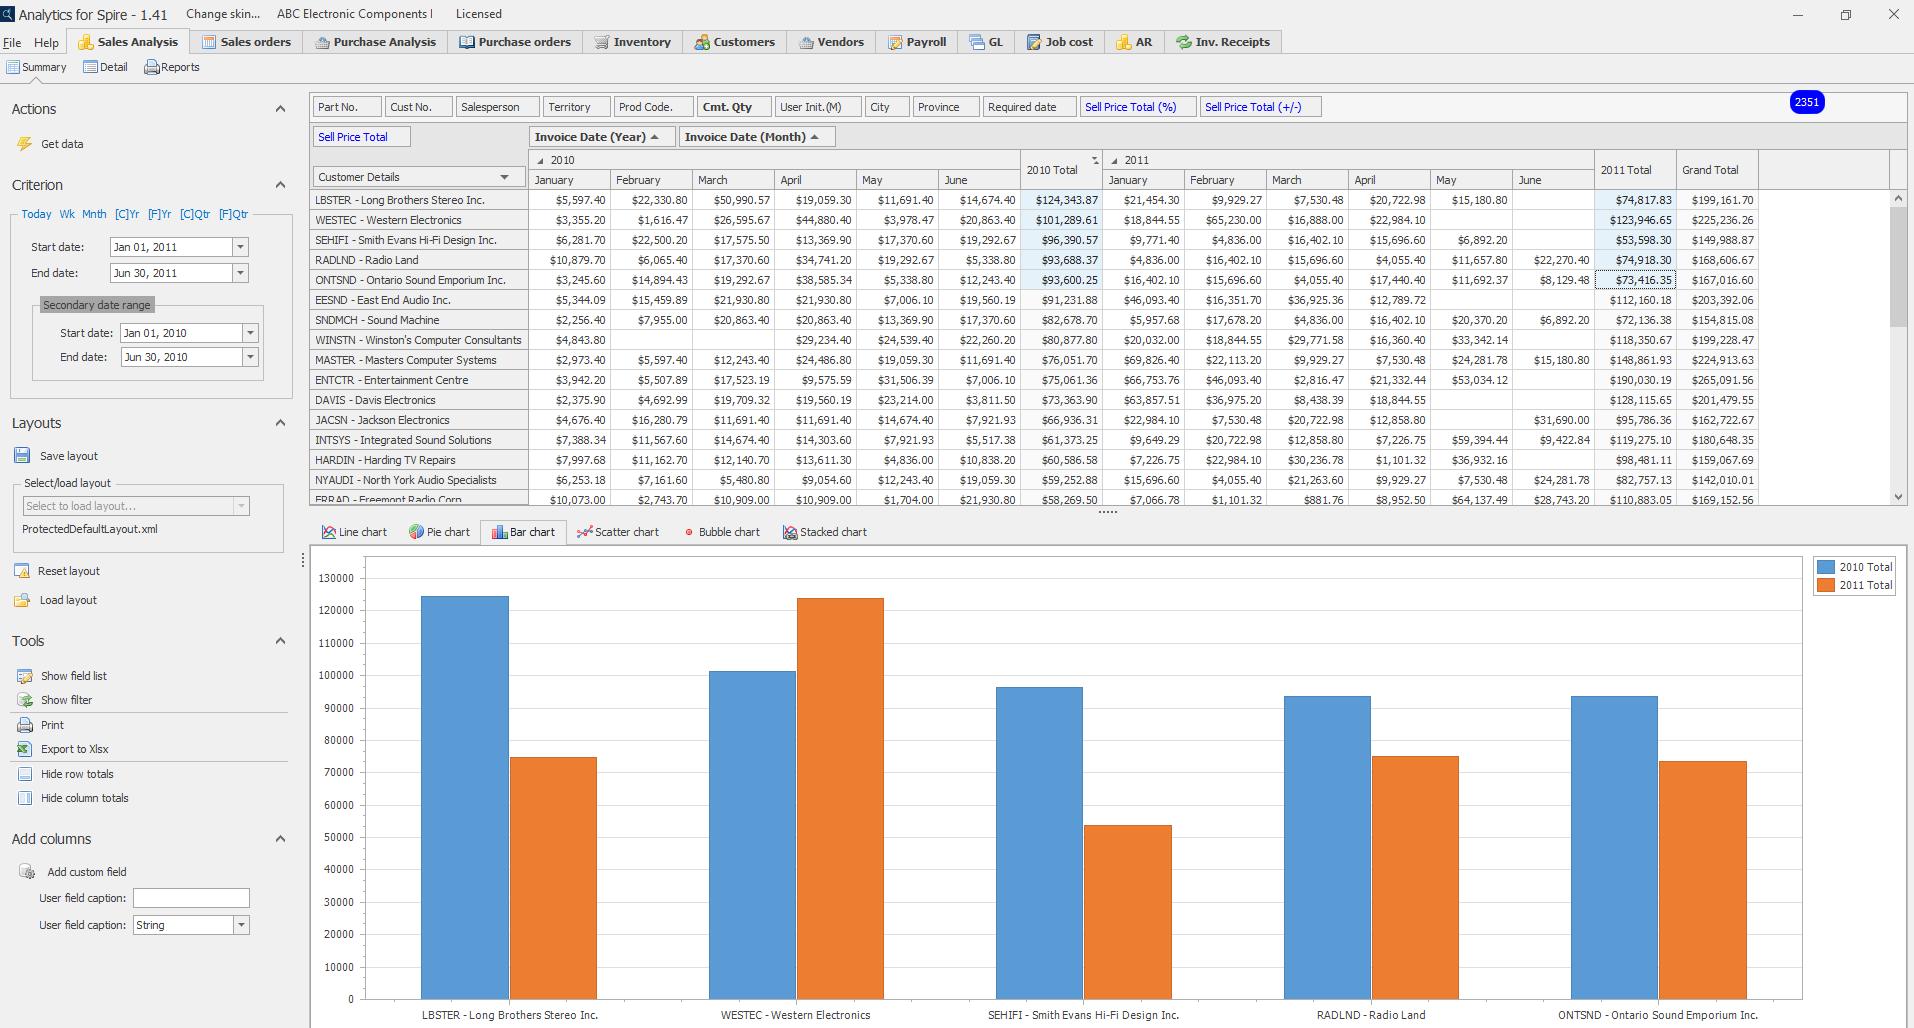 Sales+Analysis+Customer+Summary.png